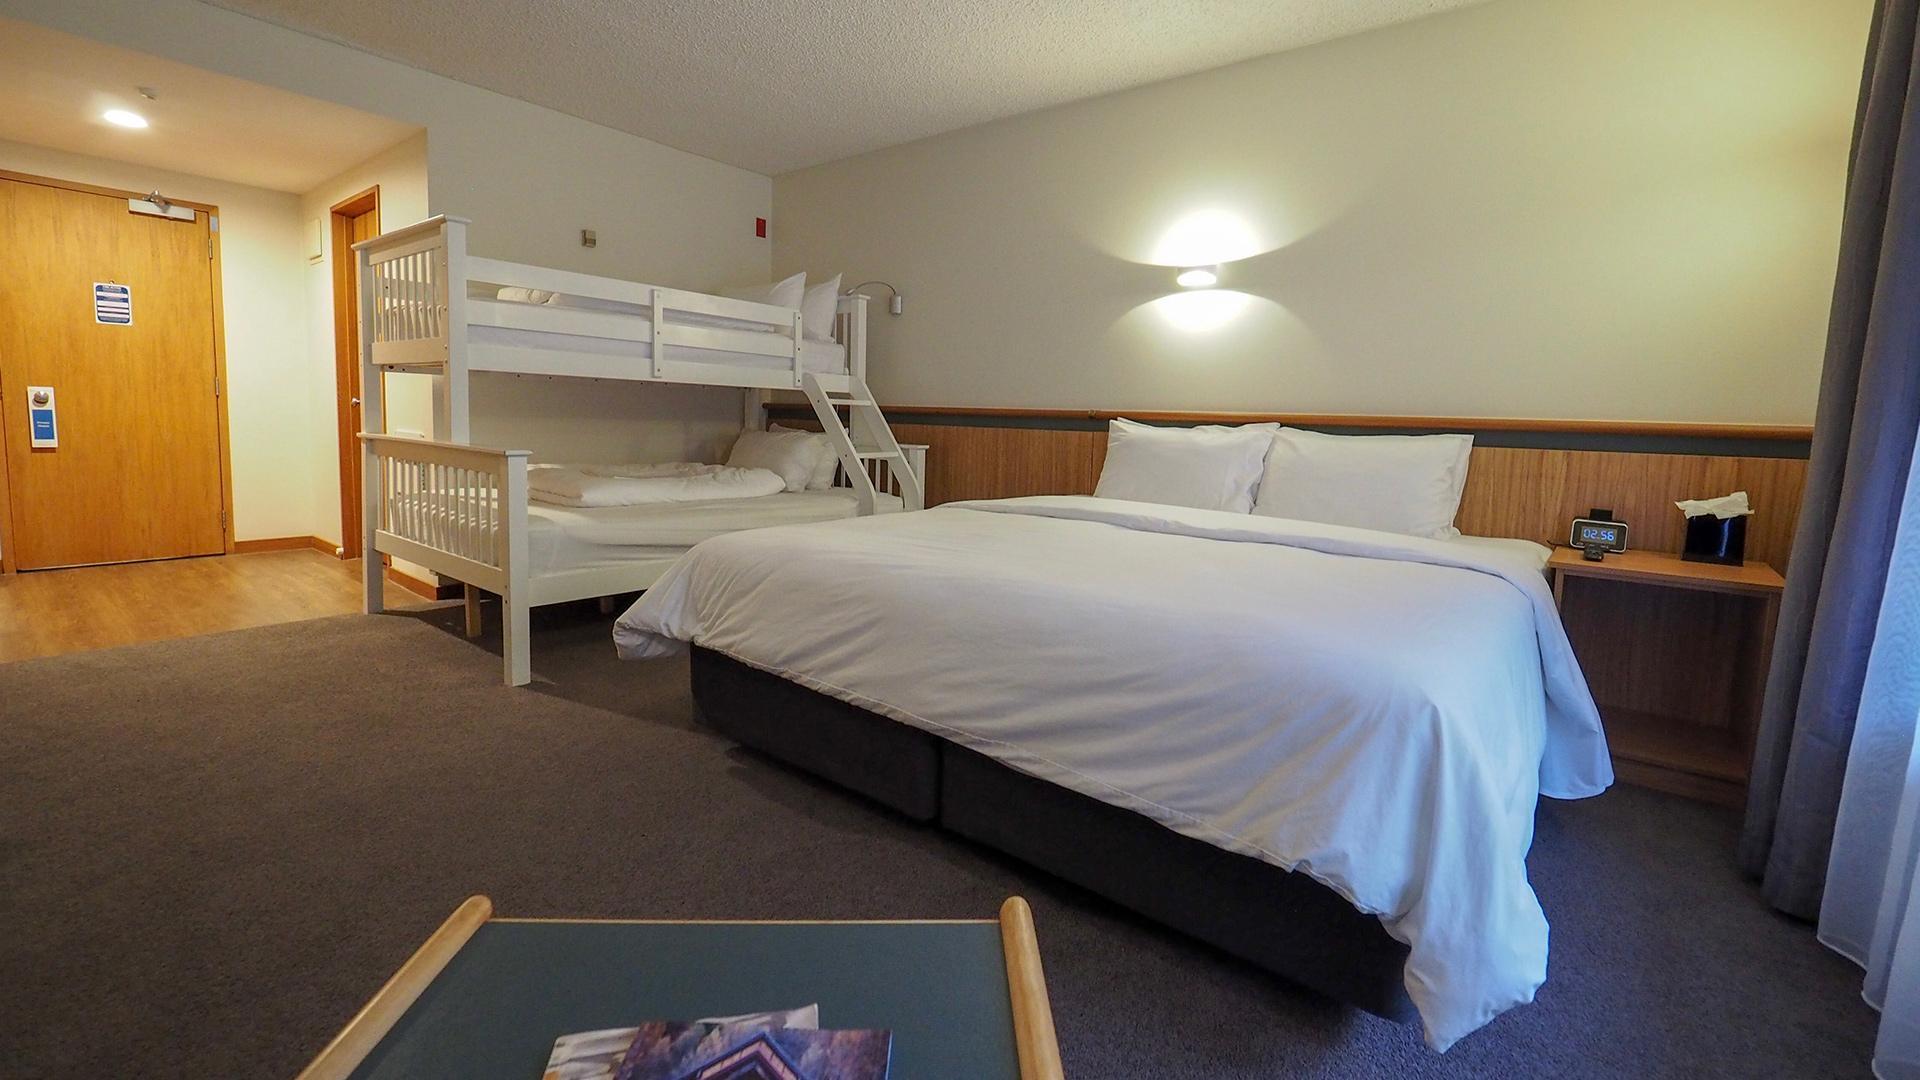 Family Room image 1 at Swiss-Belresort Coronet Peak by null, Otago, New Zealand